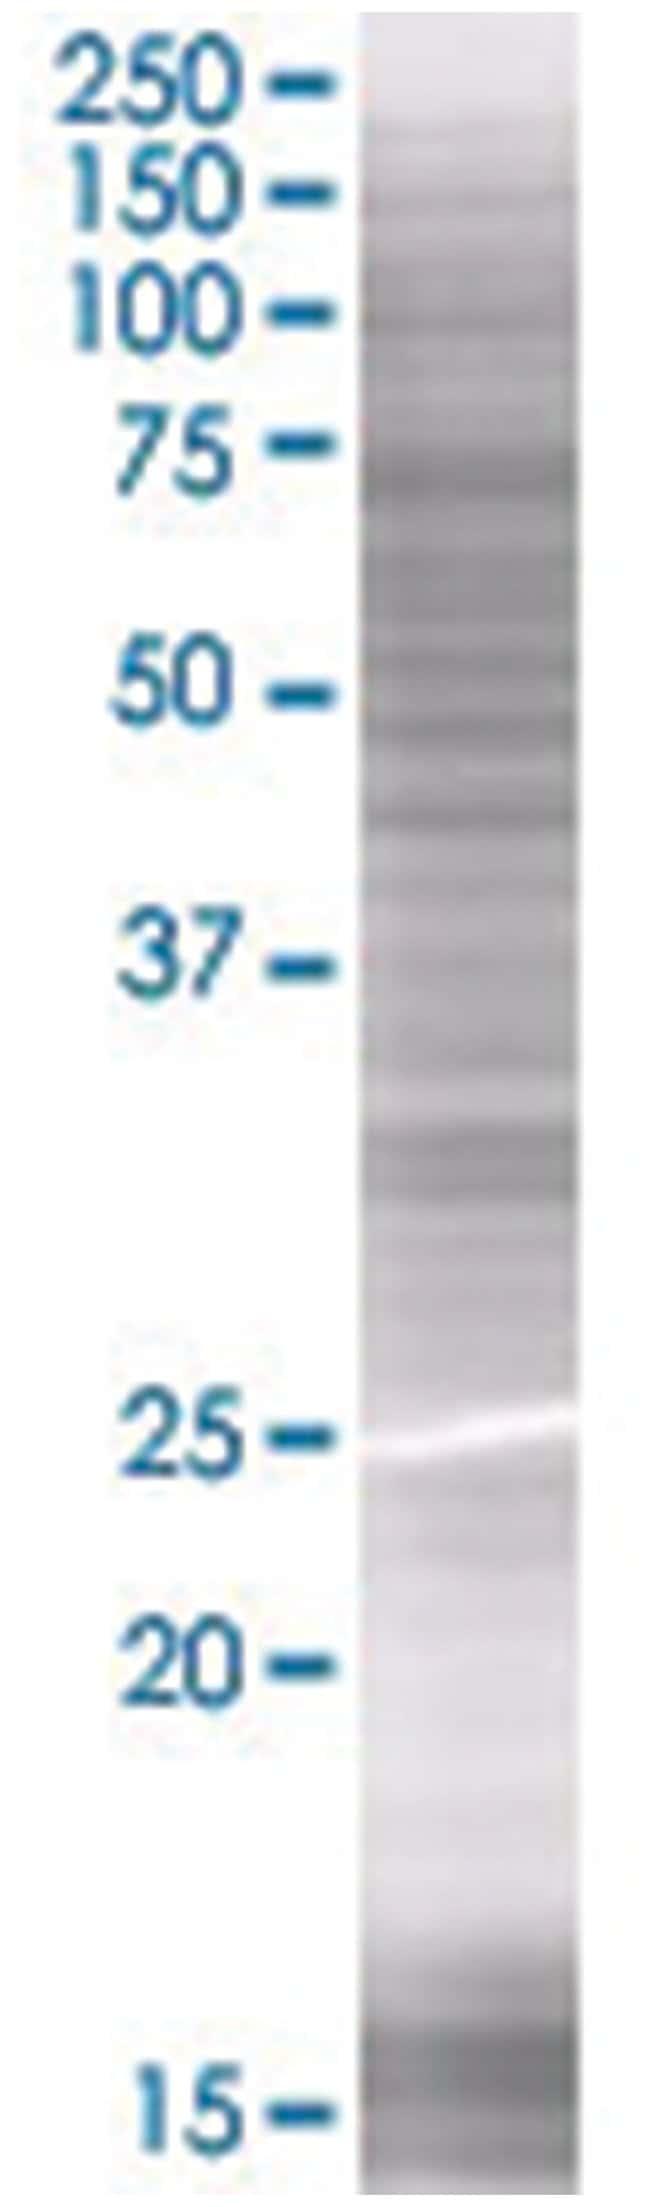 CDKN2C 293T Cell Overexpression Lysate (Denatured), Abnova 100µL:Life